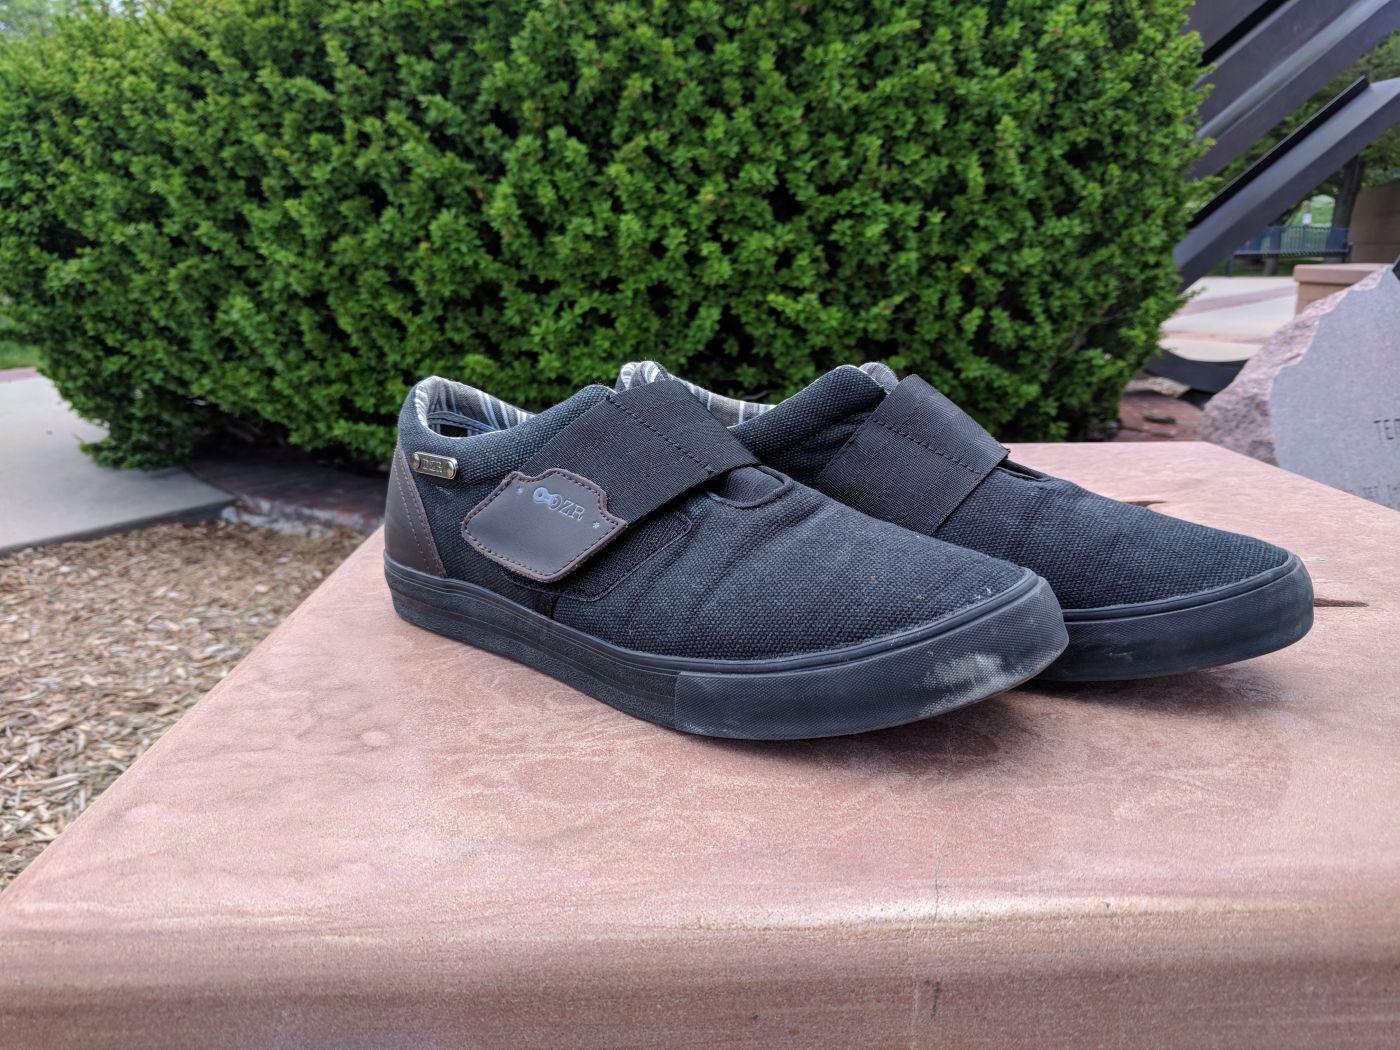 e3222dad15 Reviewed  DZR Jetlag Nero Commuter Shoes - FeedTheHabit.com